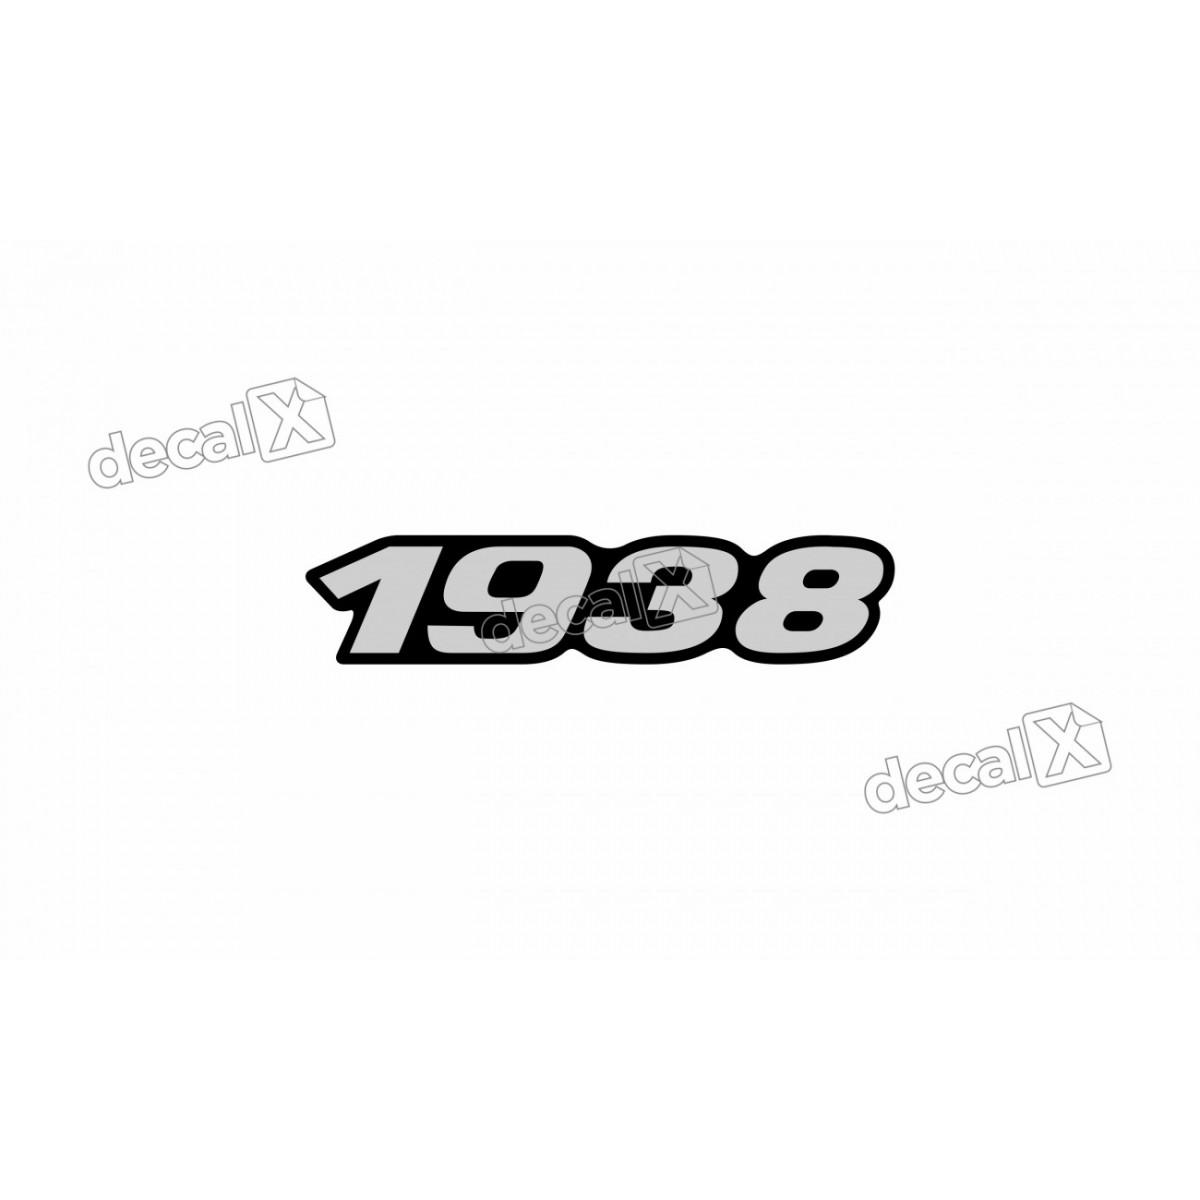 Adesivo Emblema Resinado Mercedes 1938 Cm72 Decalx